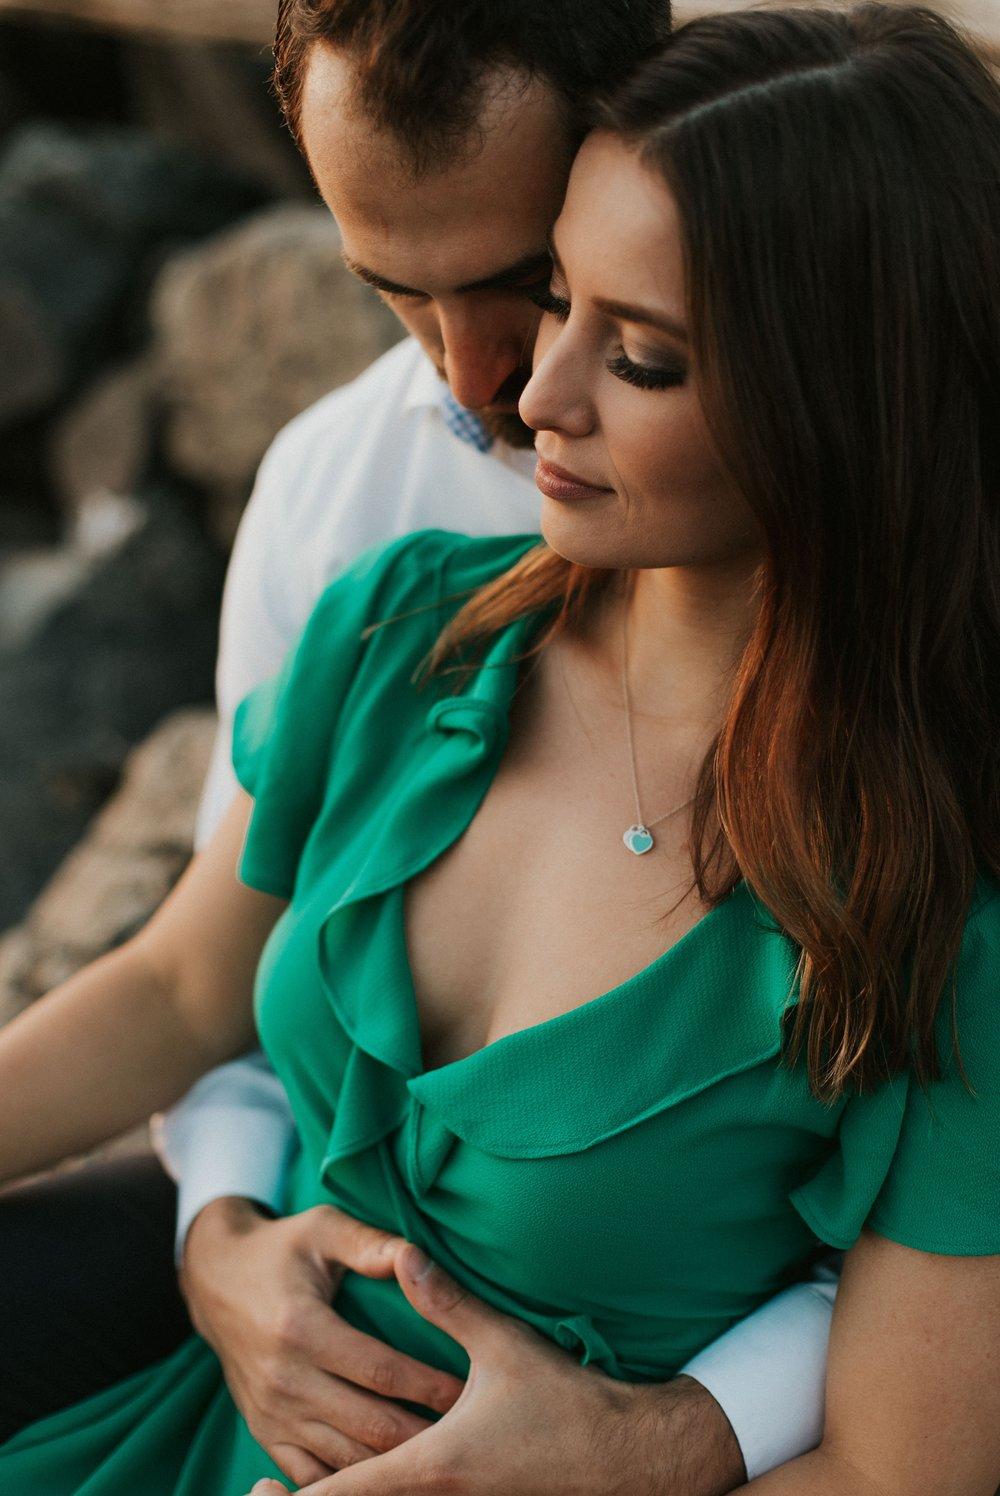 Sarah_Anne_Photo_Discovery_Park_Engagement_ 18.jpg